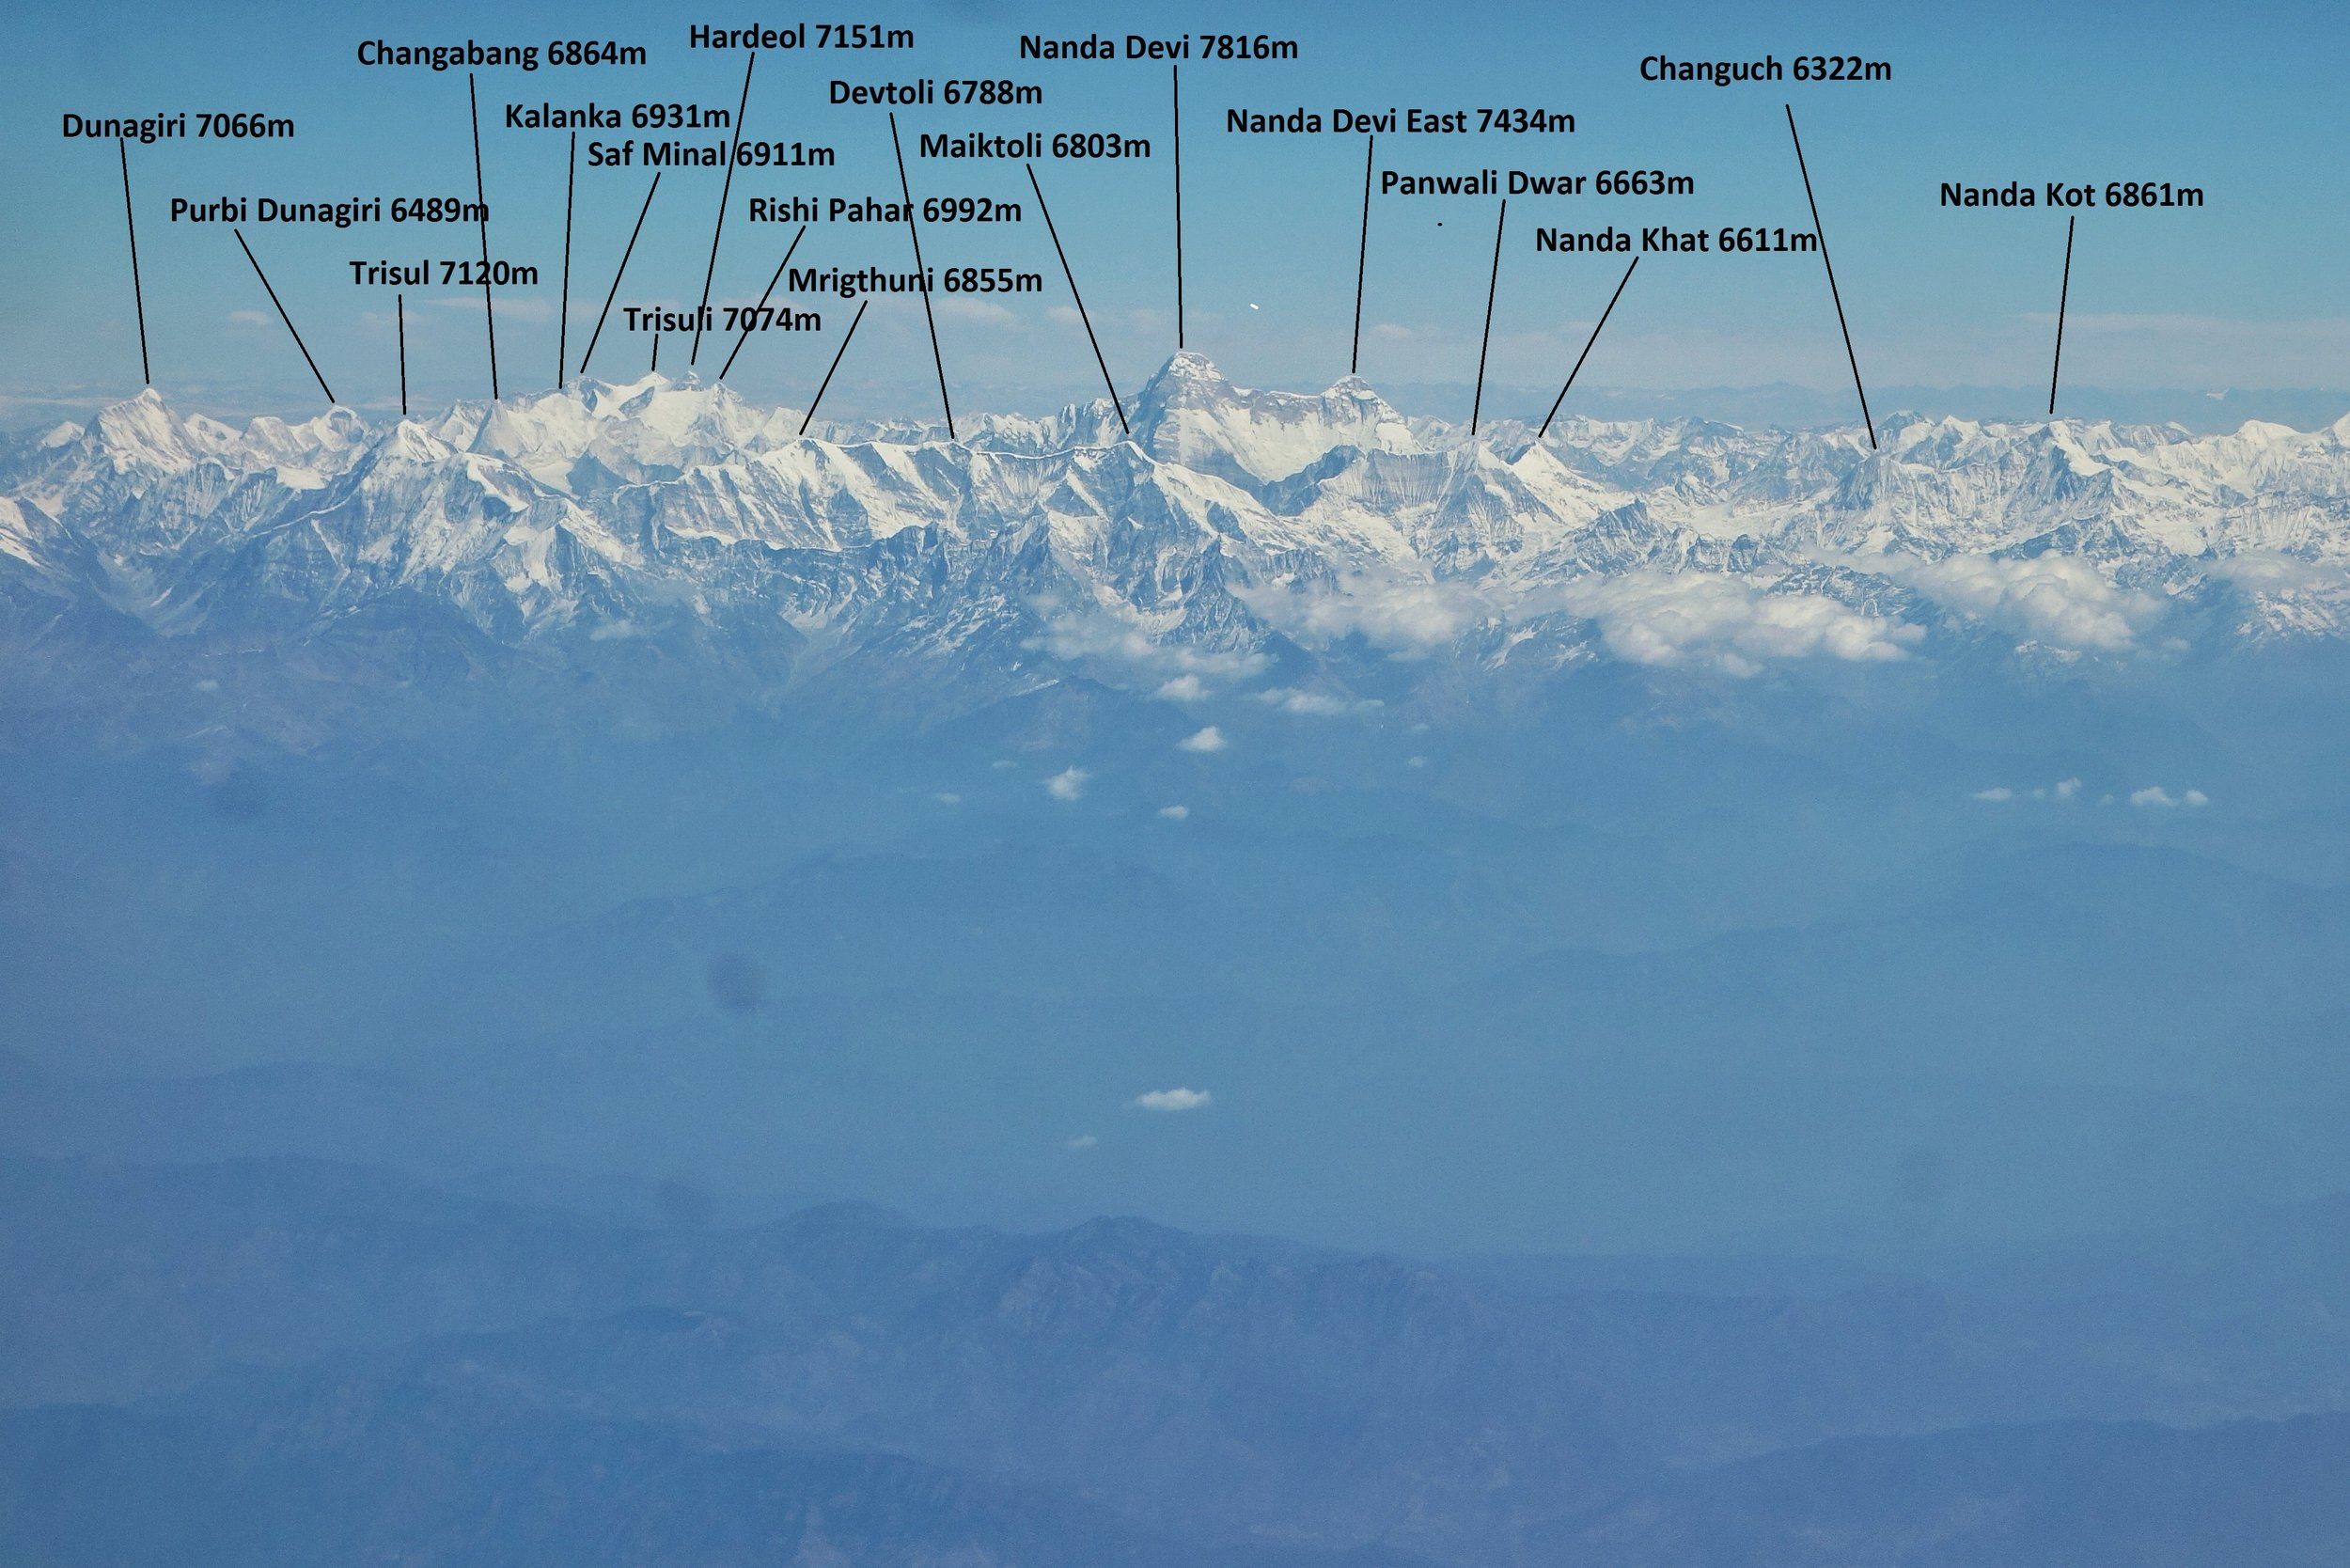 Other Peaks surrounding the Nanda Devi